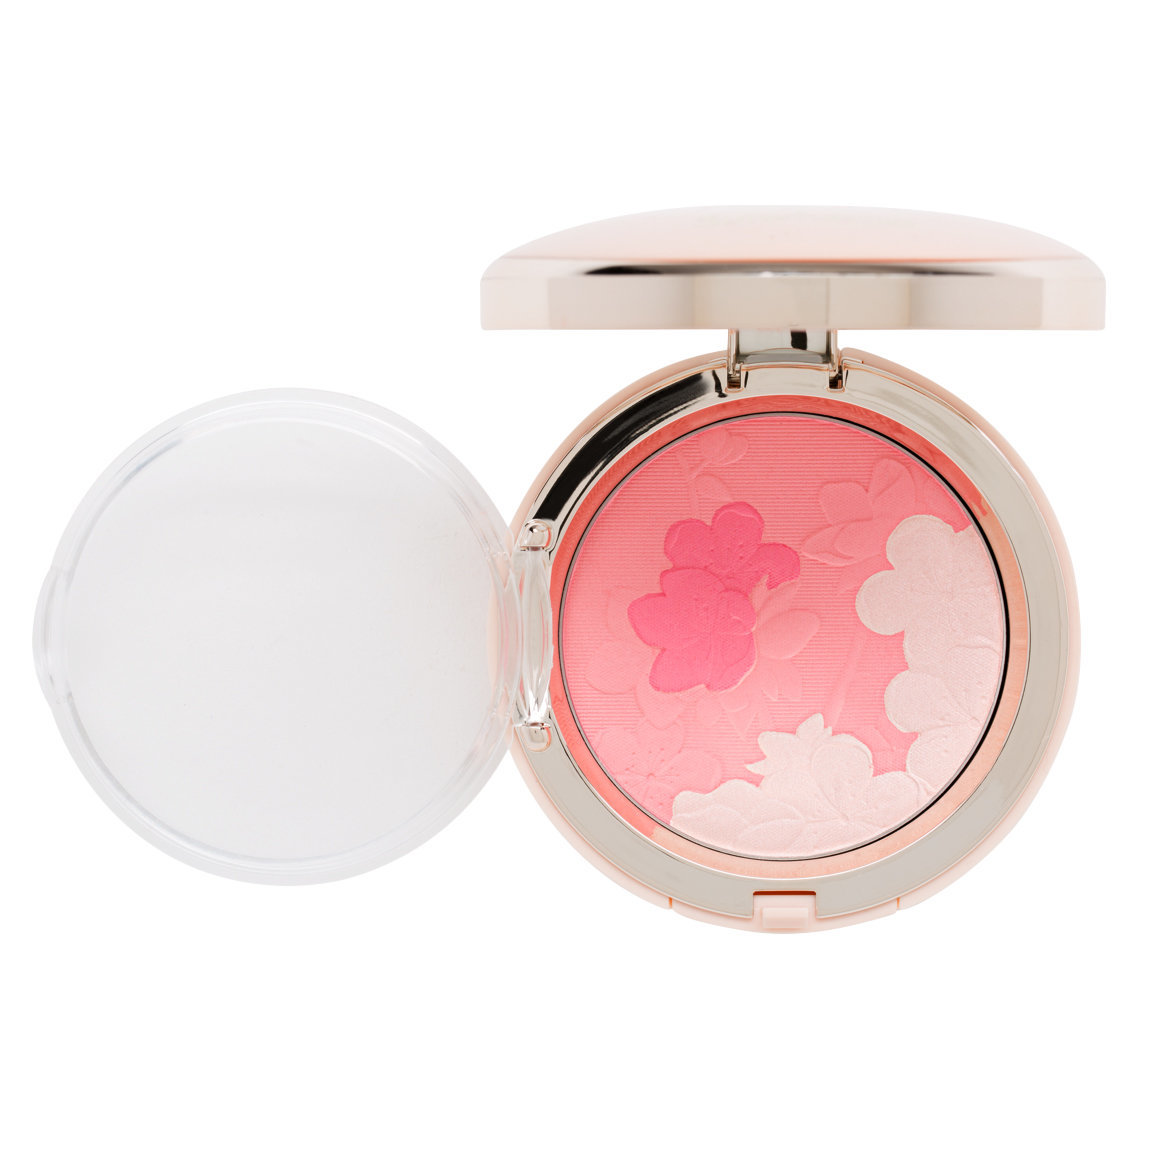 Sulwhasoo Radiance Blusher  1 Pink Harmony product swatch.